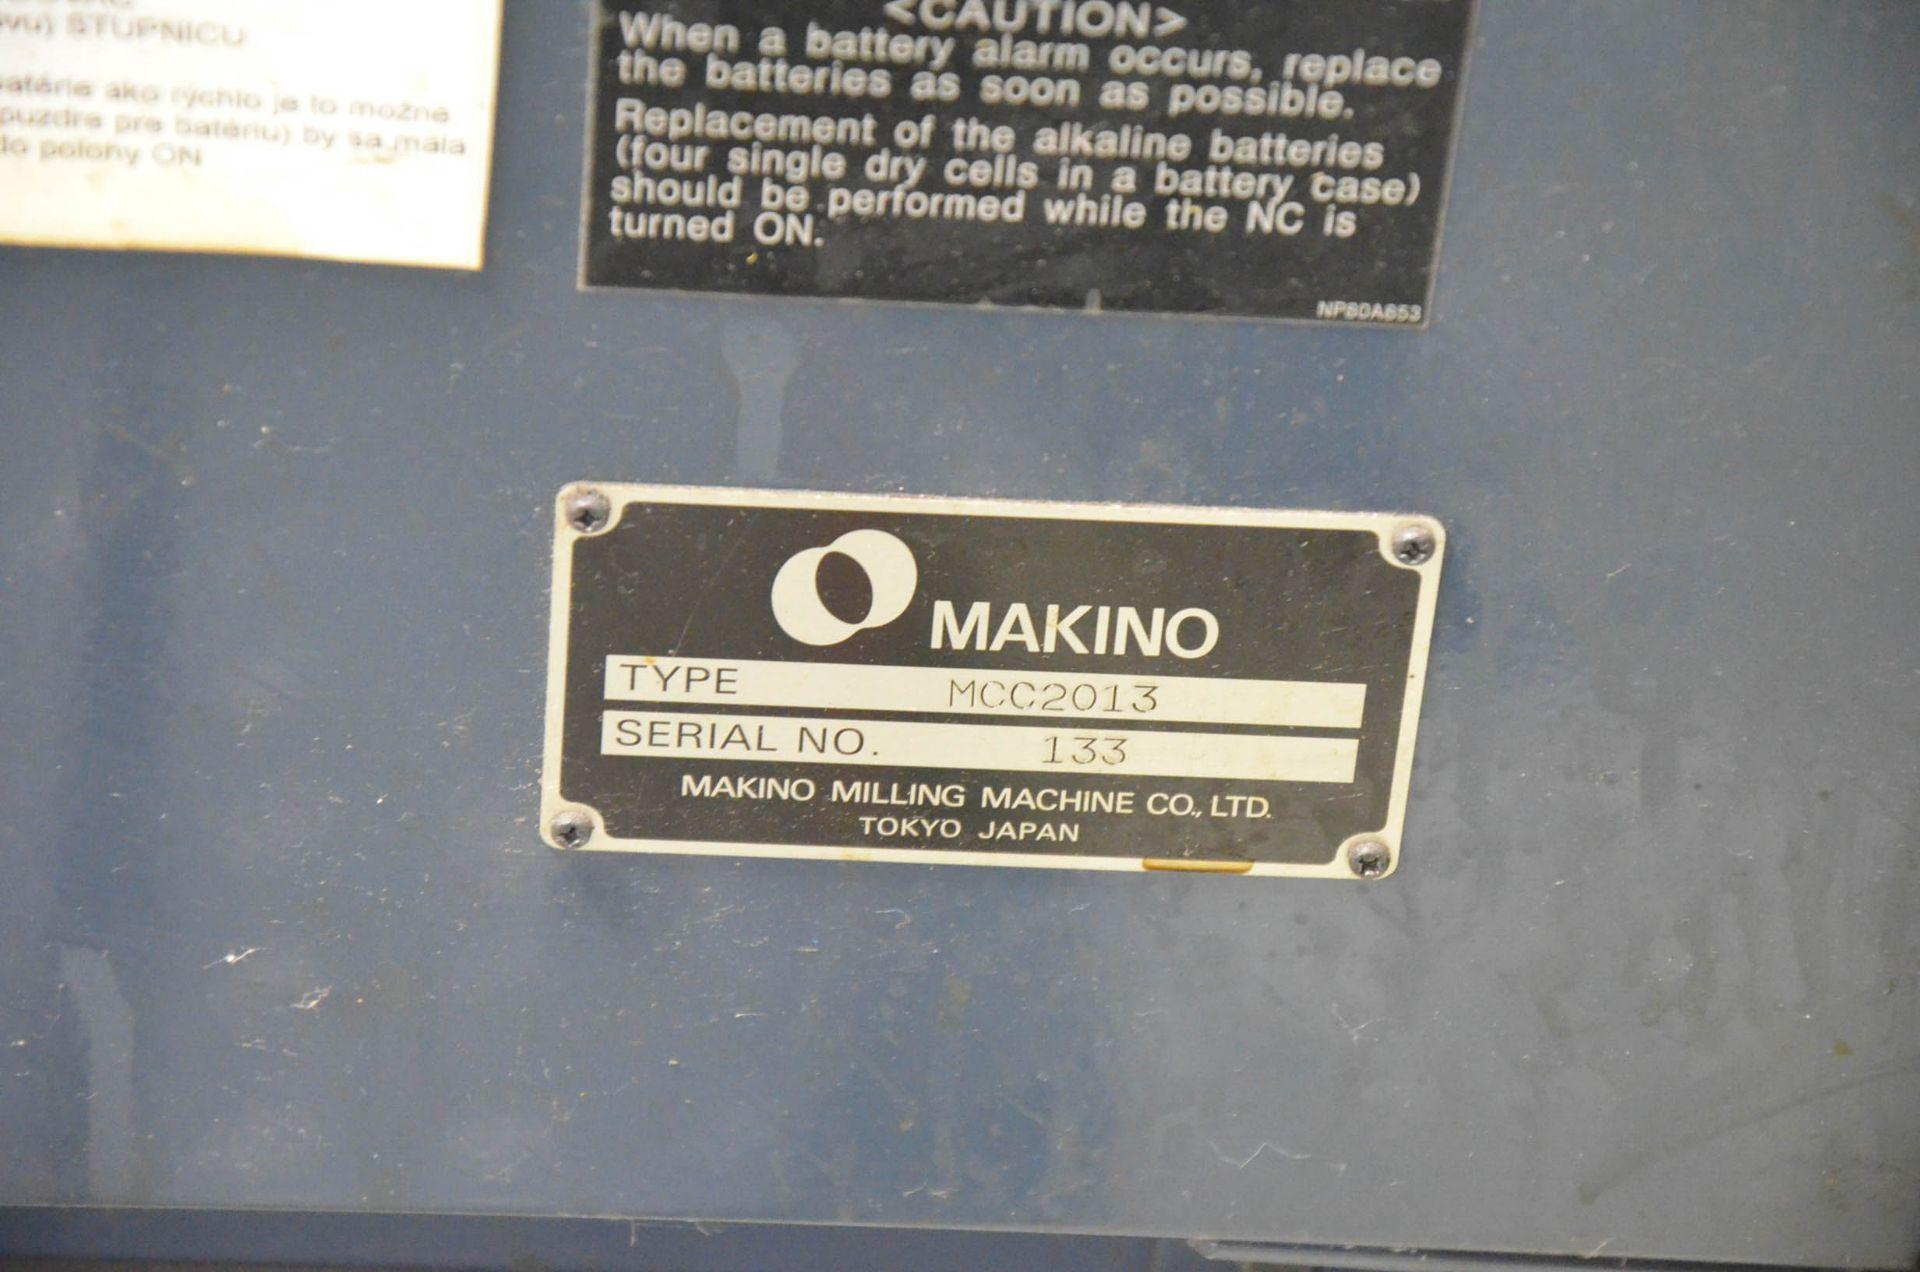 MAKINO (2008) MCC2013 4-AXIS HORIZONTAL MACHINING CENTER WITH MAKINO PROFESSIONAL 5 CNC CONTROL, - Image 5 of 12